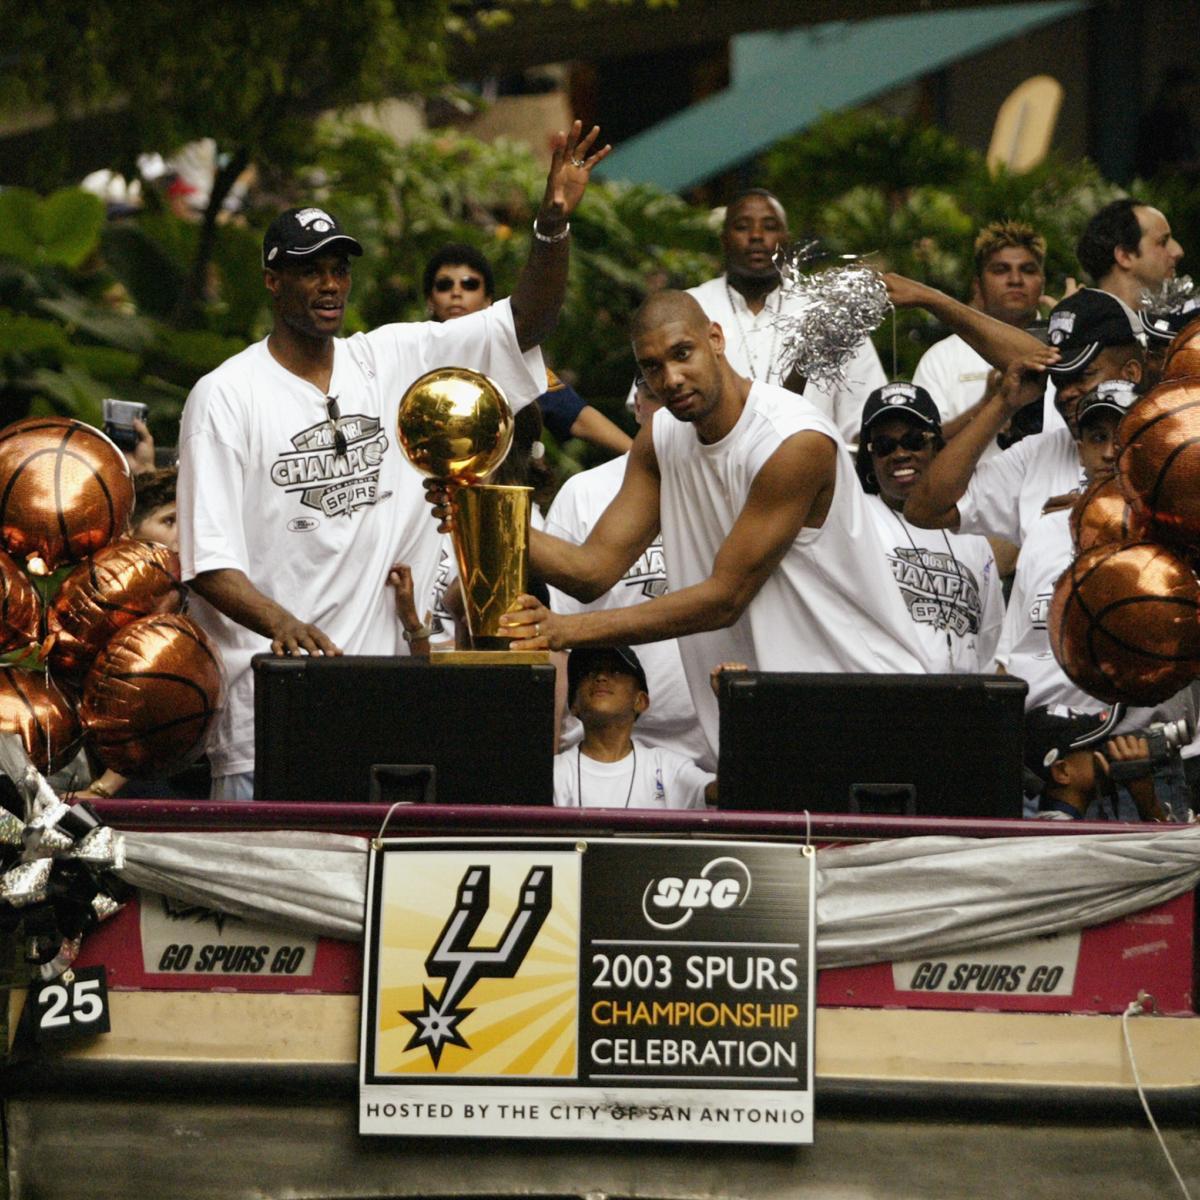 Spurs First Team Players Squad: San Antonio Spurs' All-Time Dream Team